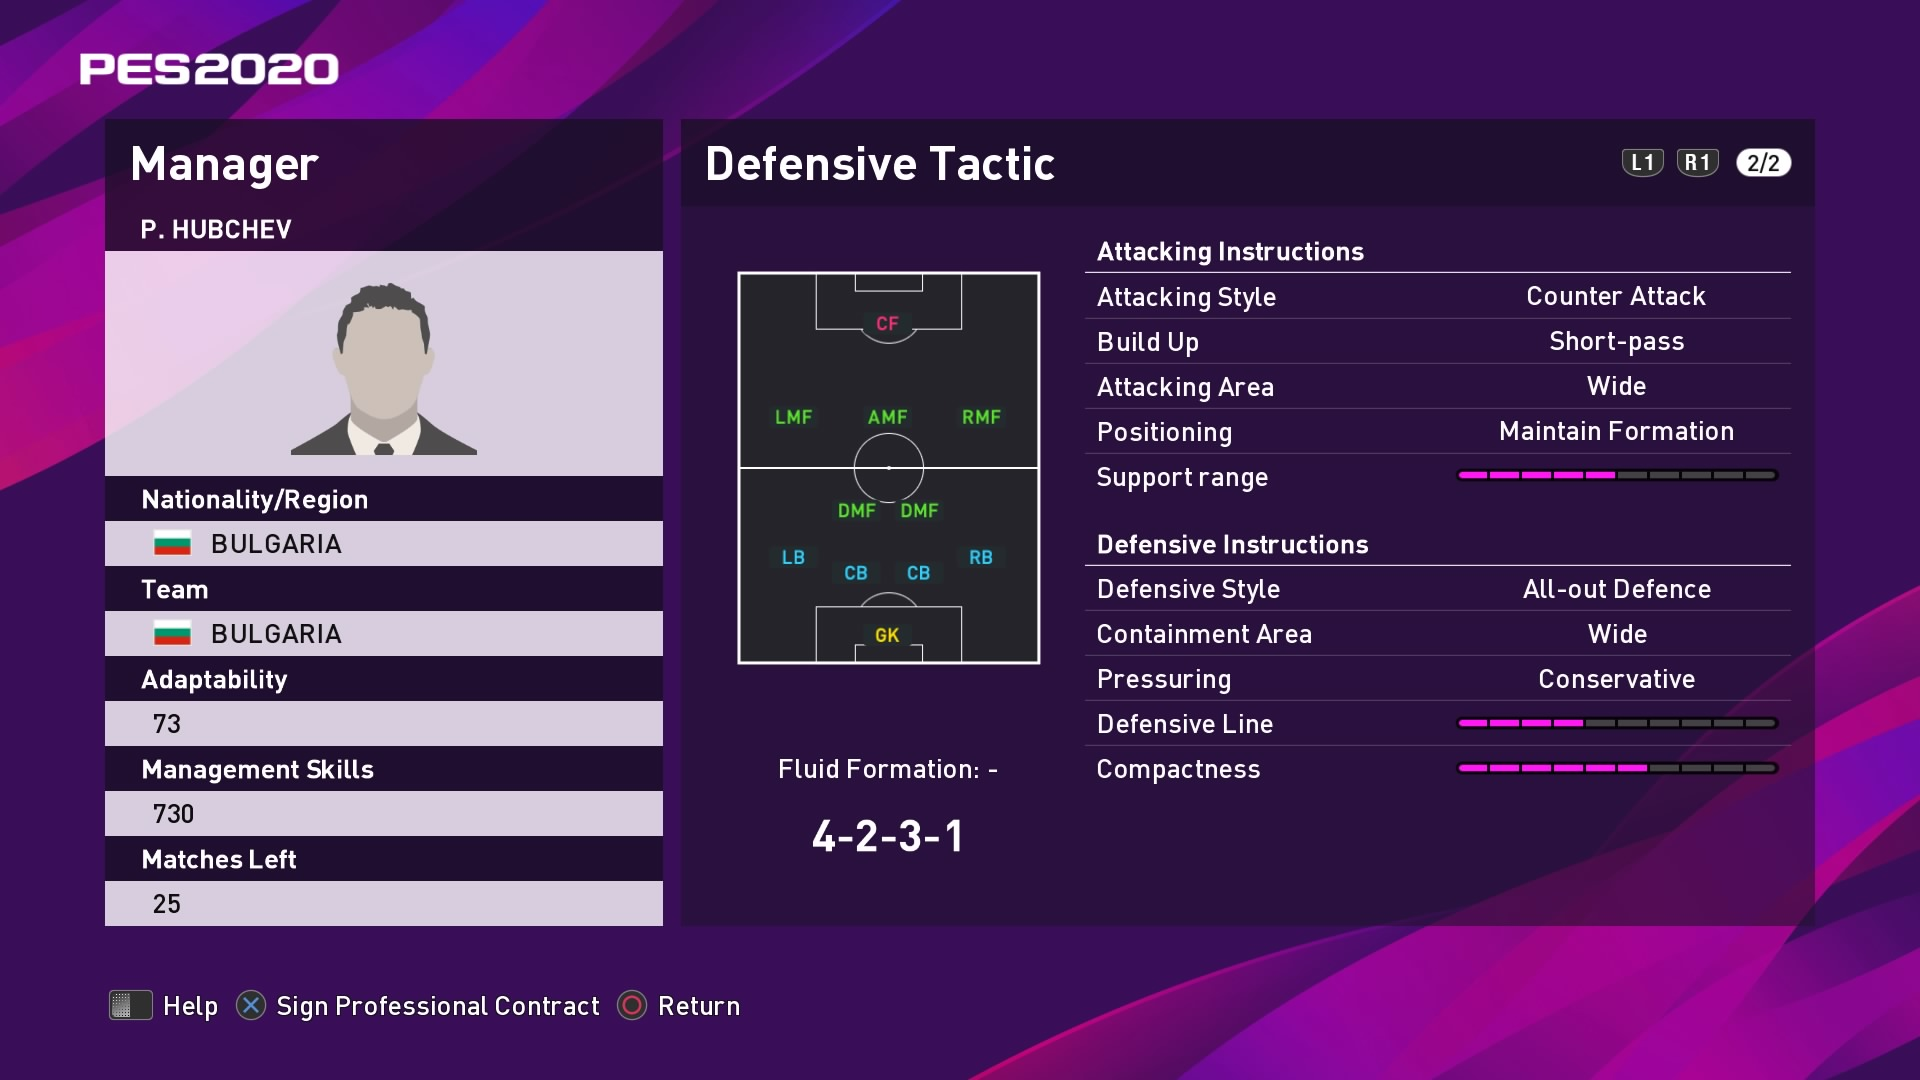 P. Hubchev (Petar Hubchev) Defensive Tactic in PES 2020 myClub